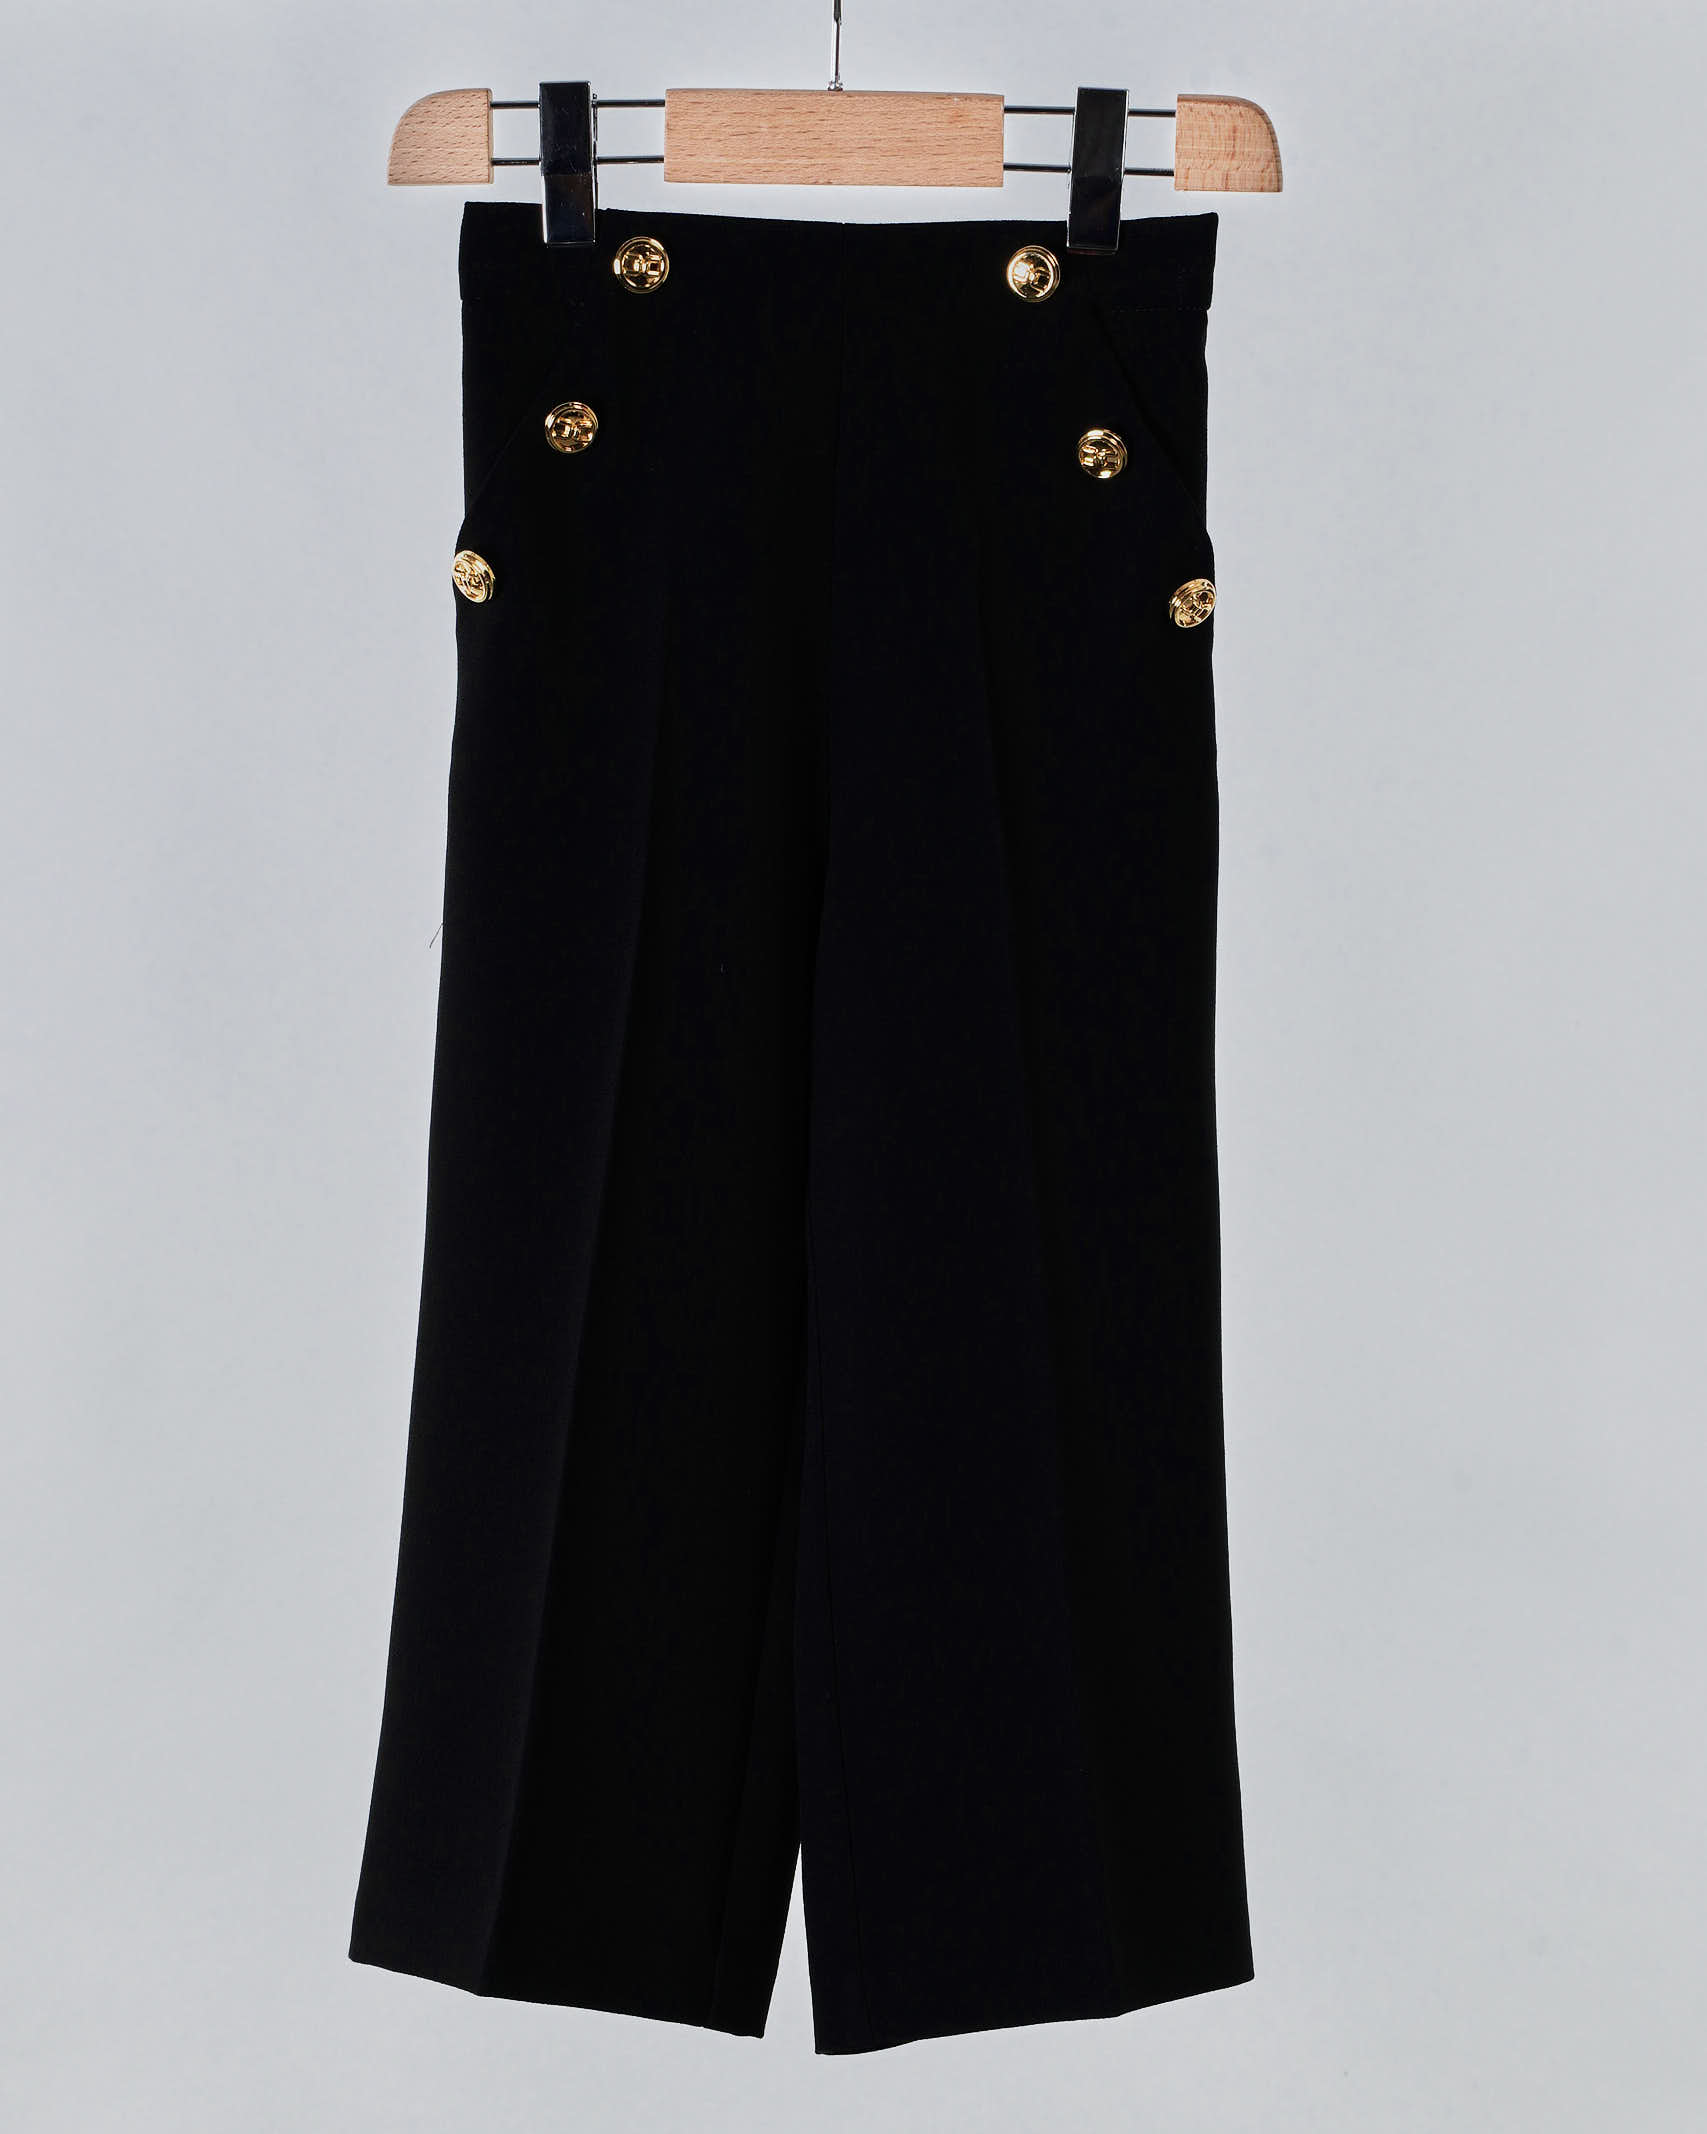 Pantalone con bottoni oro light Elisabetta Franchi La Mia Bambina ELISABETTA FRANCHI LA MIA BAMBINA | Pantalone | EFPA119GA85WE025N015